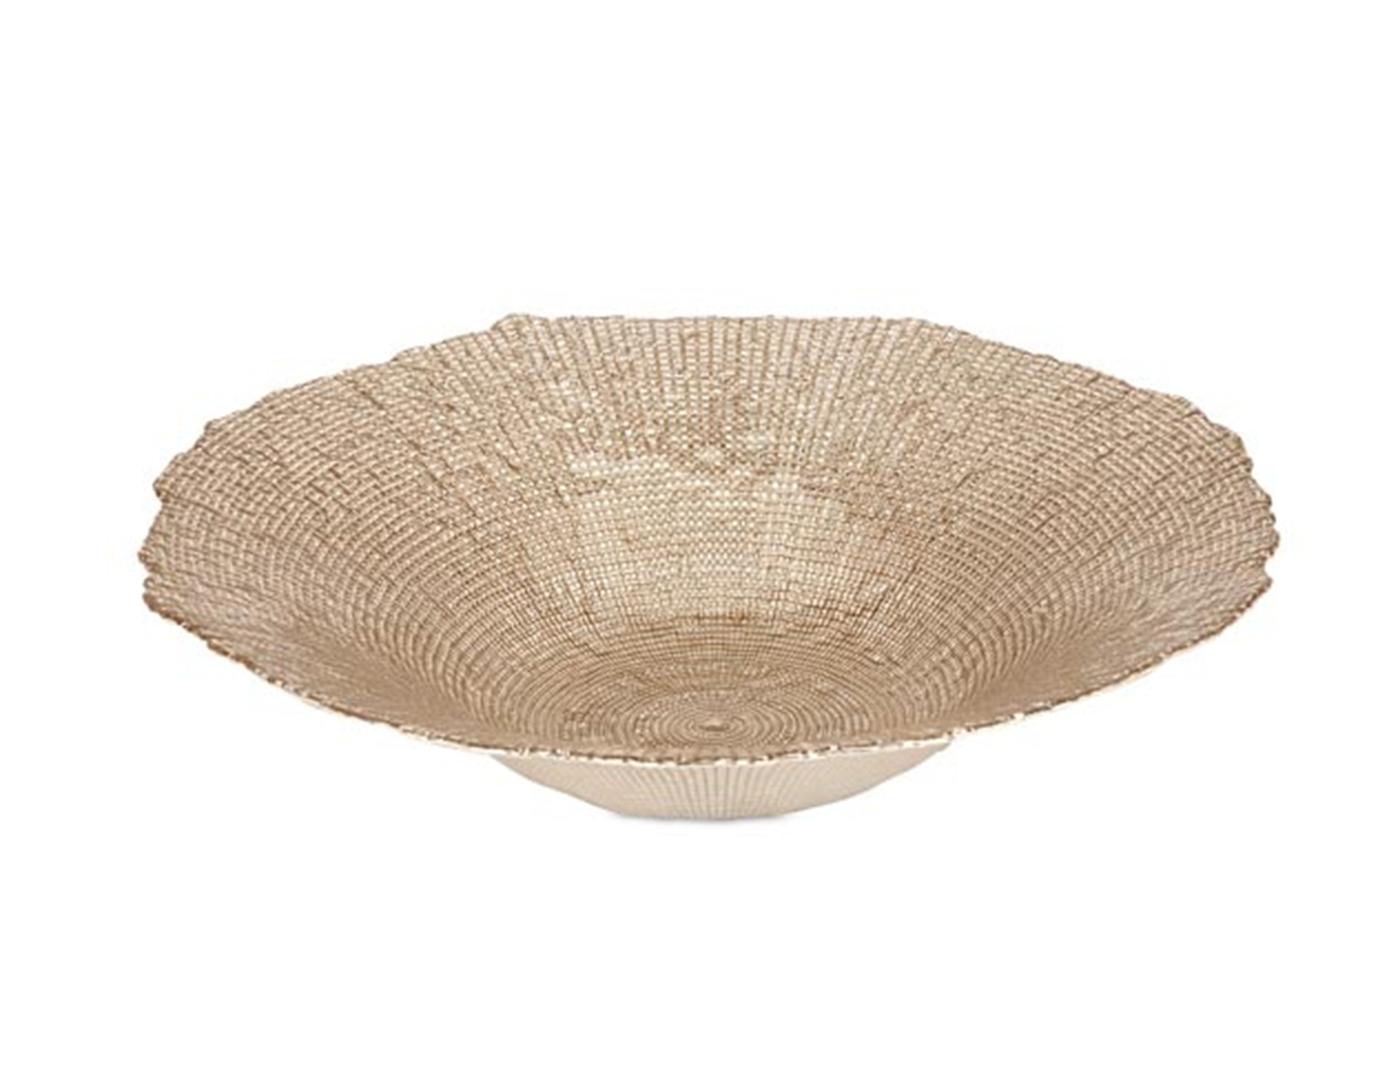 Gold Decorative Bowl Steinhafels Aqua And Gold Decorative Bowl